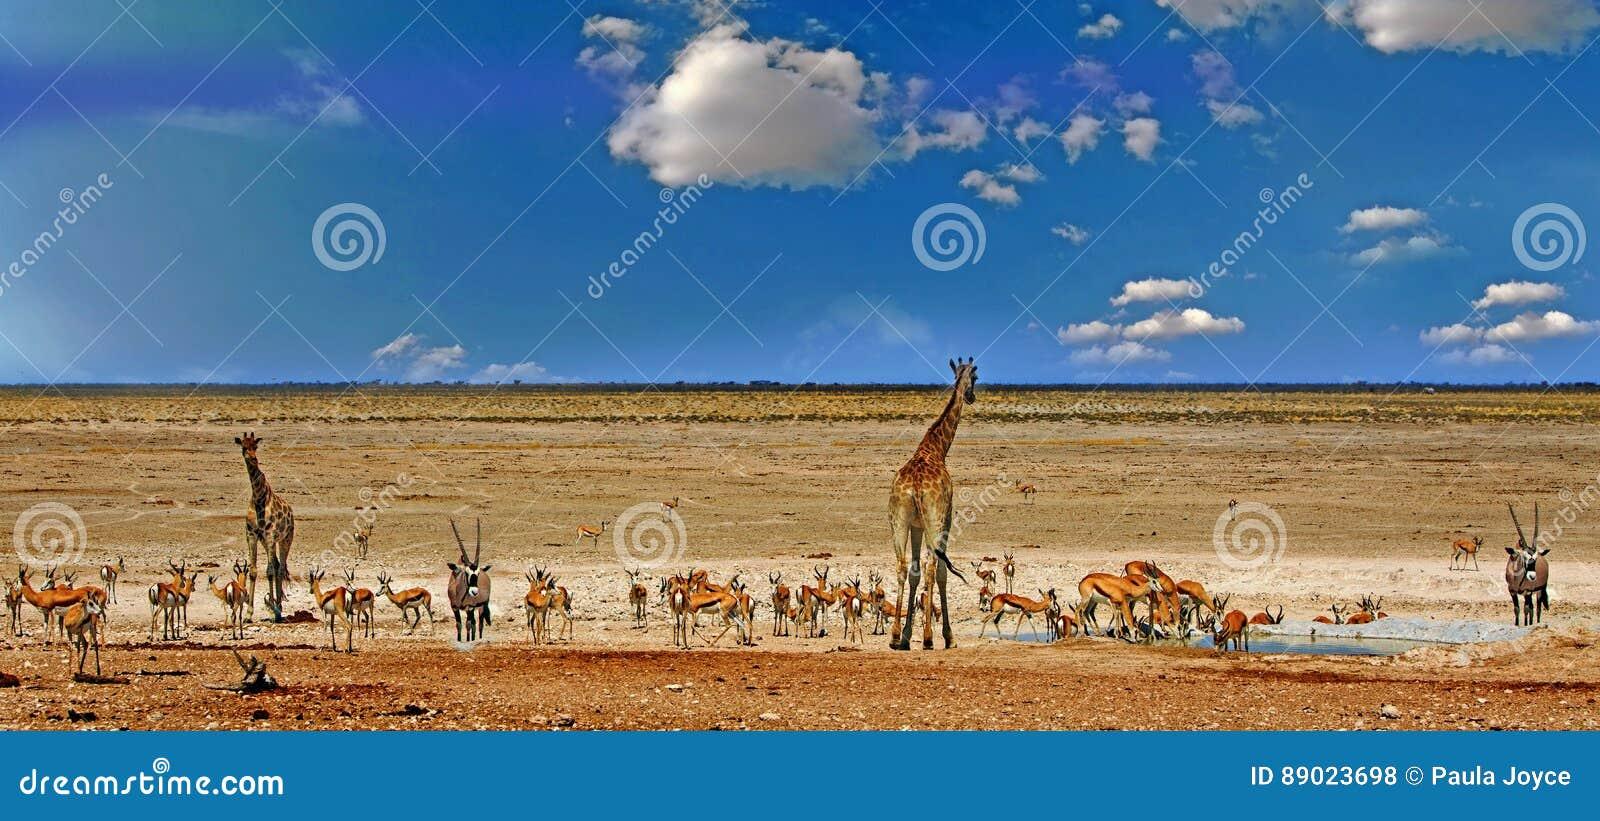 Many animals around a waterhole in Etosha with giraffe, Oryx and springbok